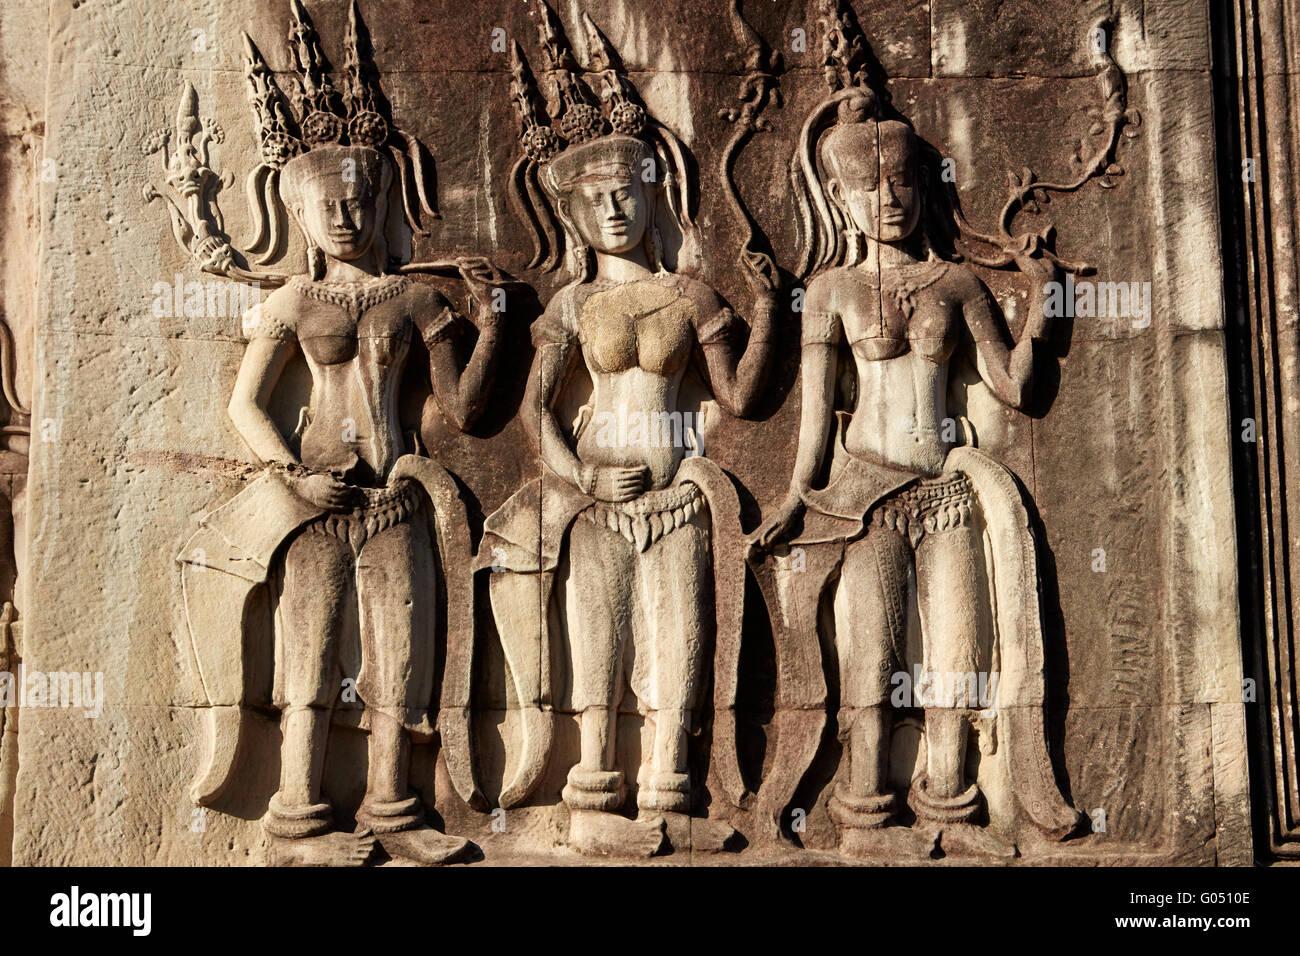 Bas relief stone carvings of apsaras angkor wat th century